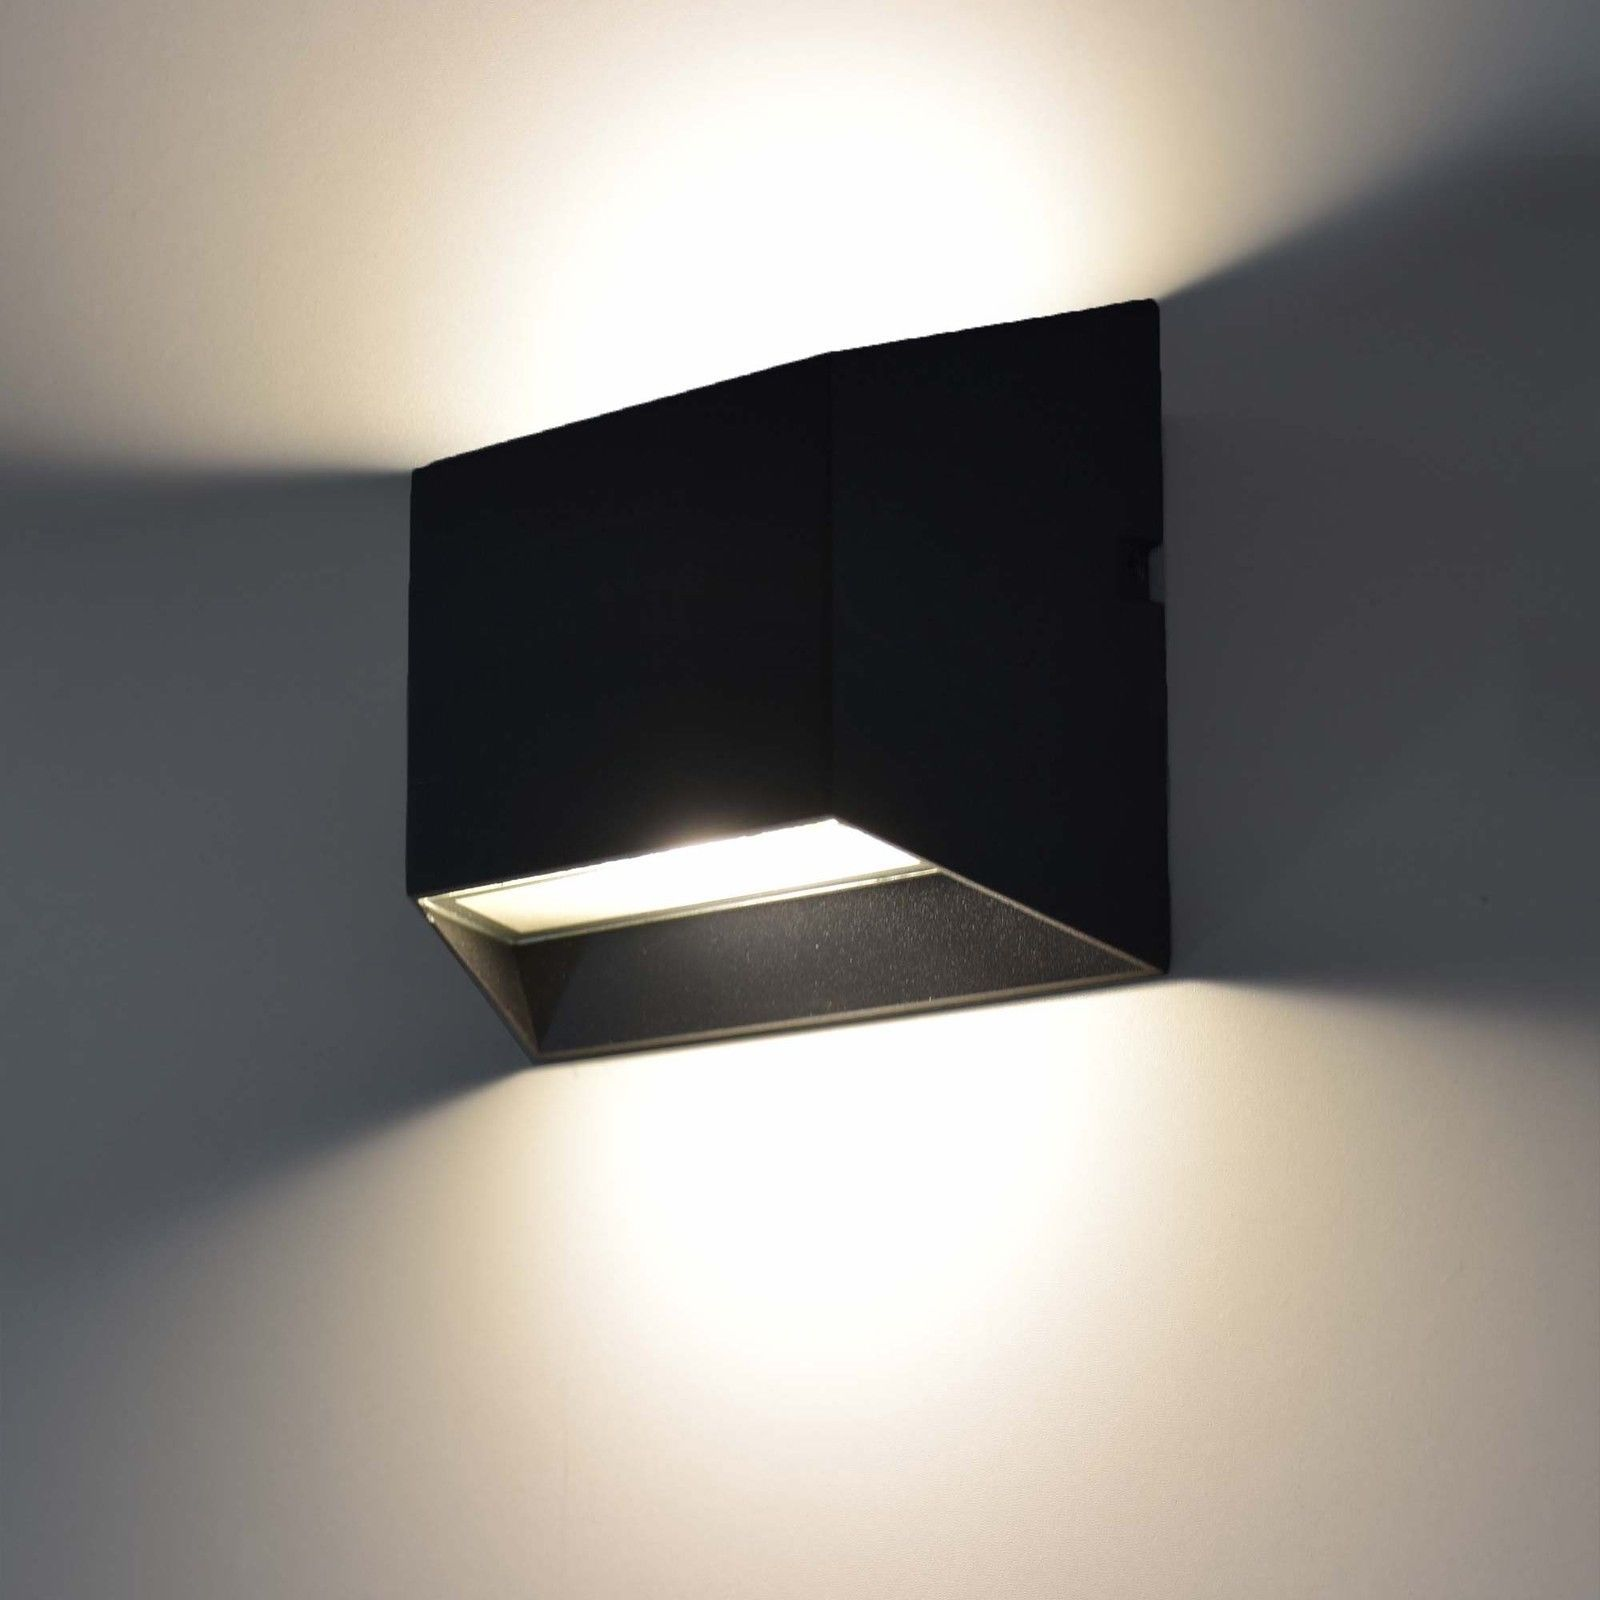 Moderne Led Aussenleuchte Wandleuchte Aussenlampe Up Down Lampe Leuchte Schwarz Ebay Led Wandleuchte Aussen Aussenlampe Wandleuchte